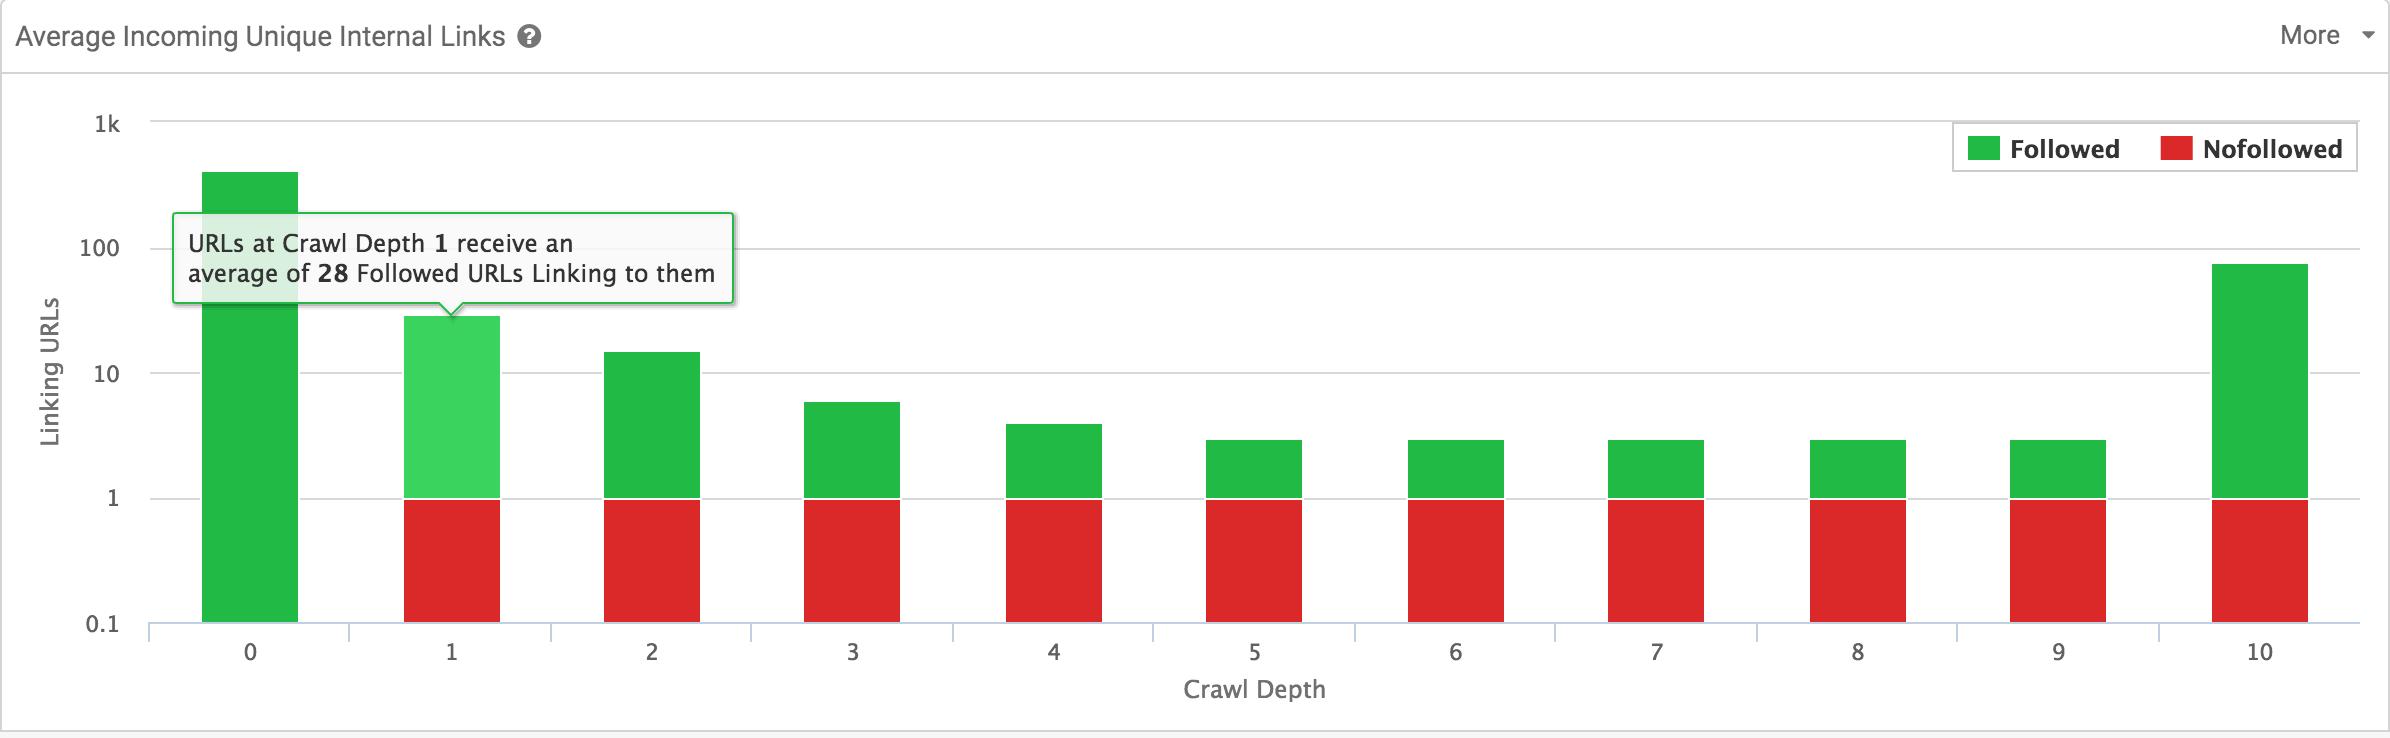 average internal link sitebulb